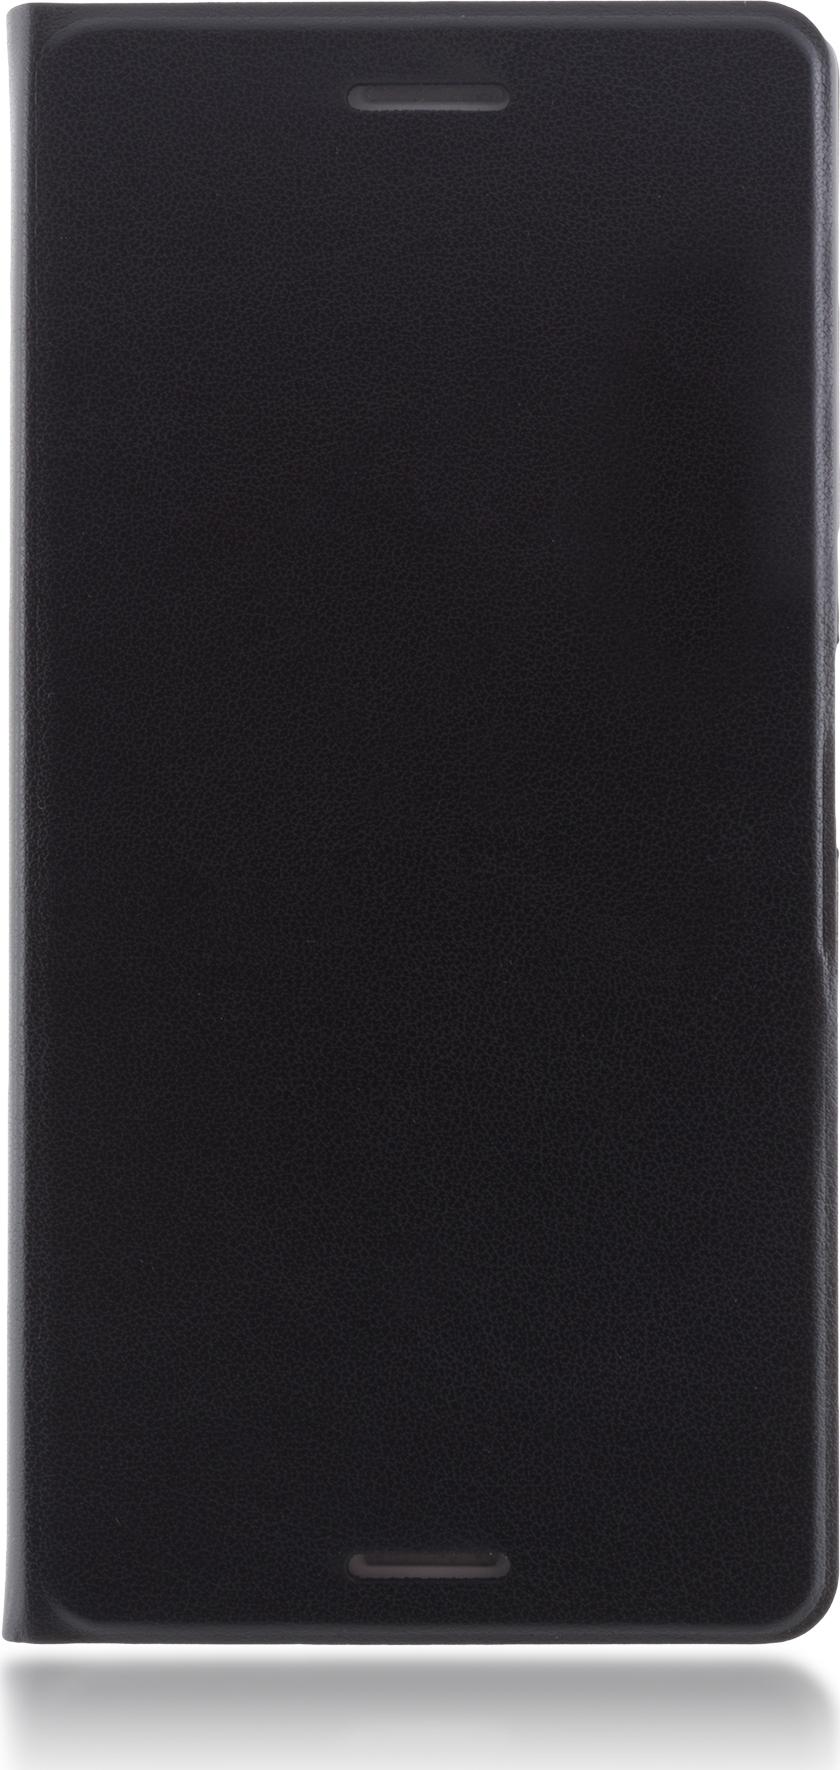 Чехол Brosco Book для Sony Xperia X, черный цена и фото